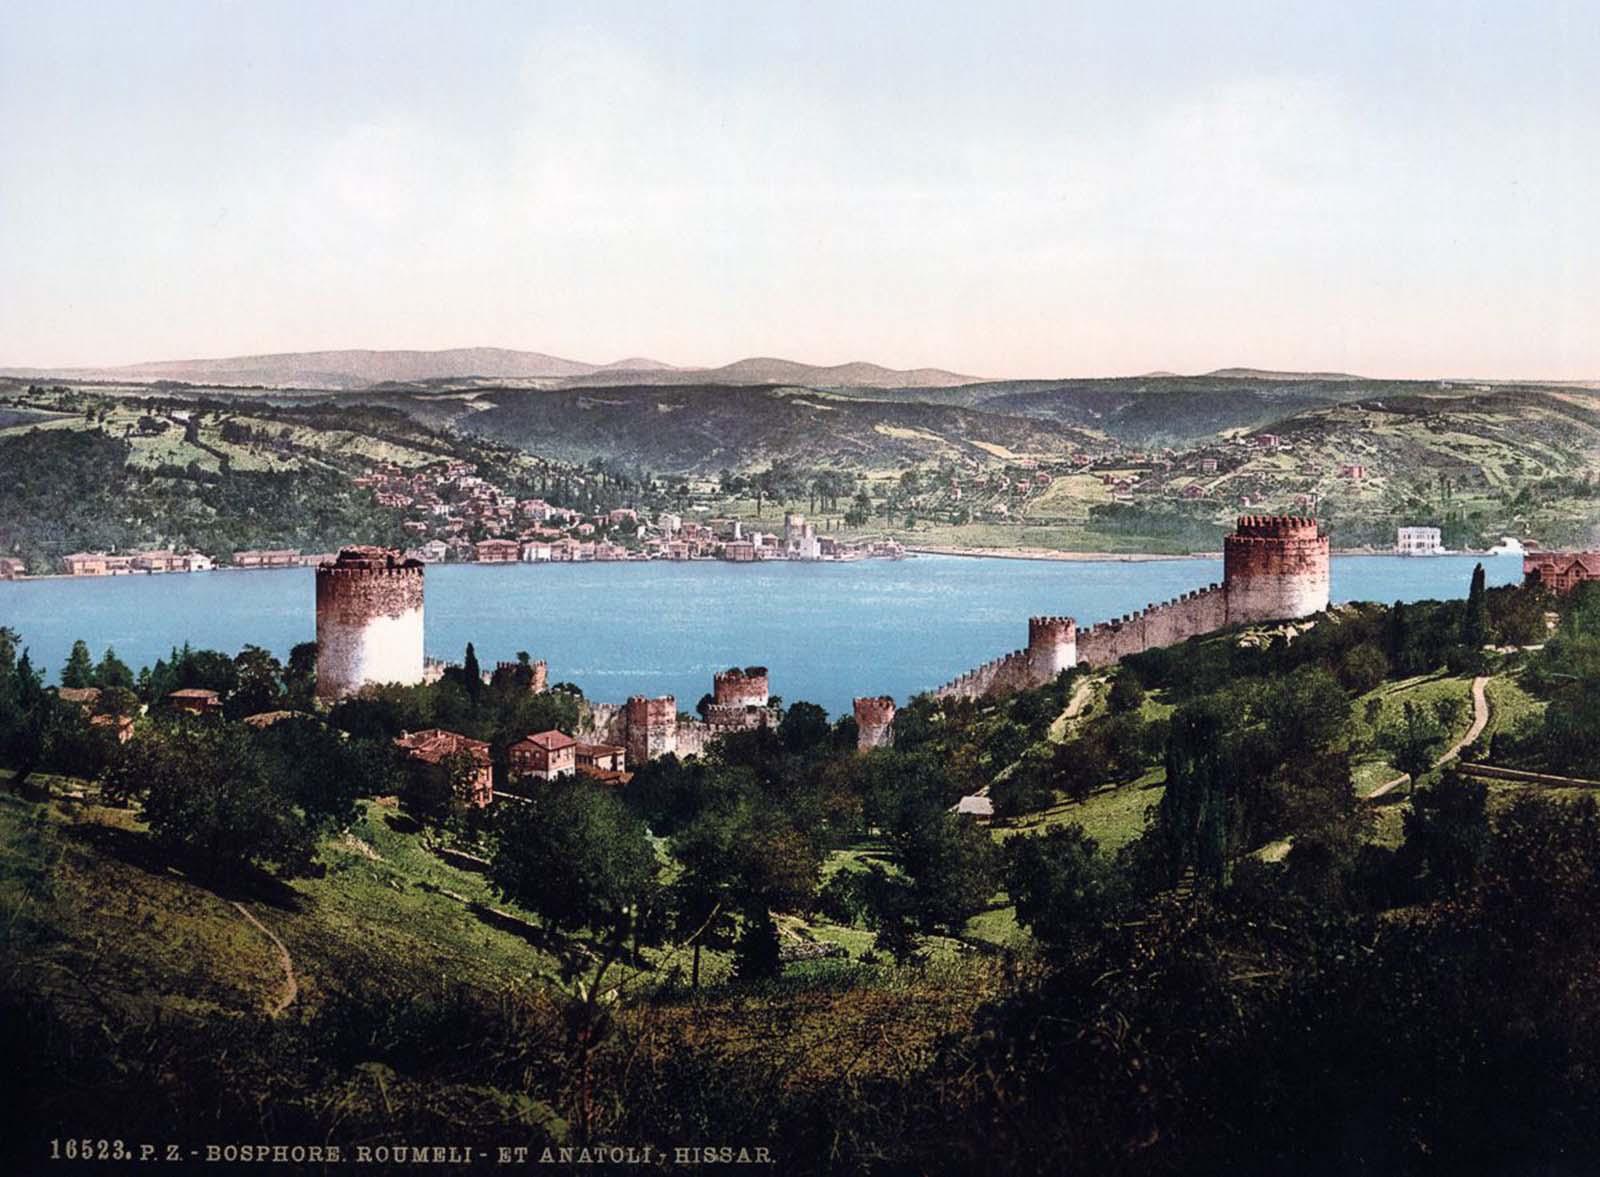 The Bosphorus, Rumeli and Anadali-Hissar.